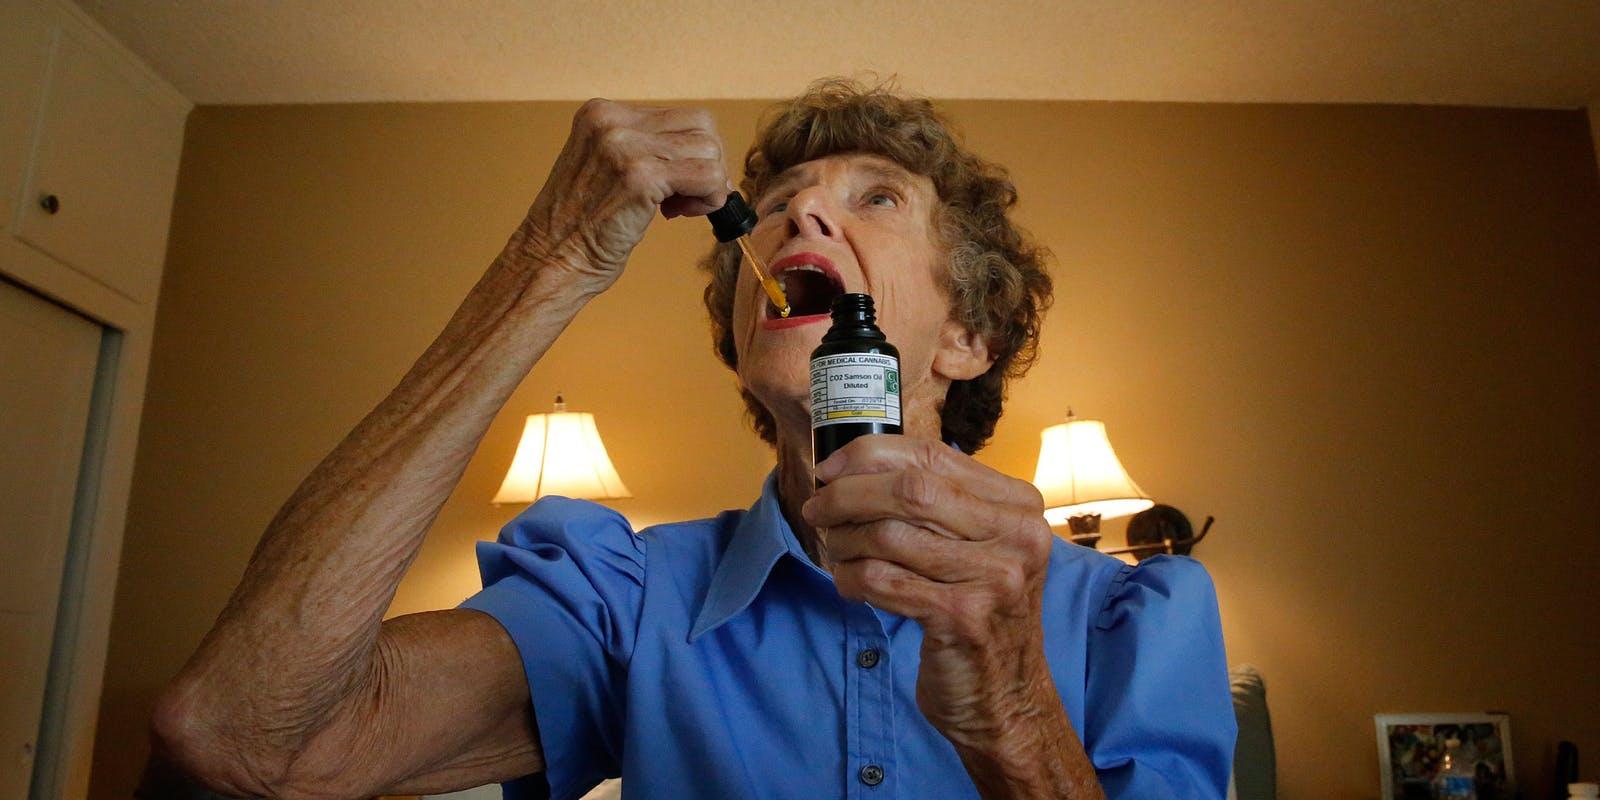 Medical Marijuana a Hit With Seniors, Survey Says